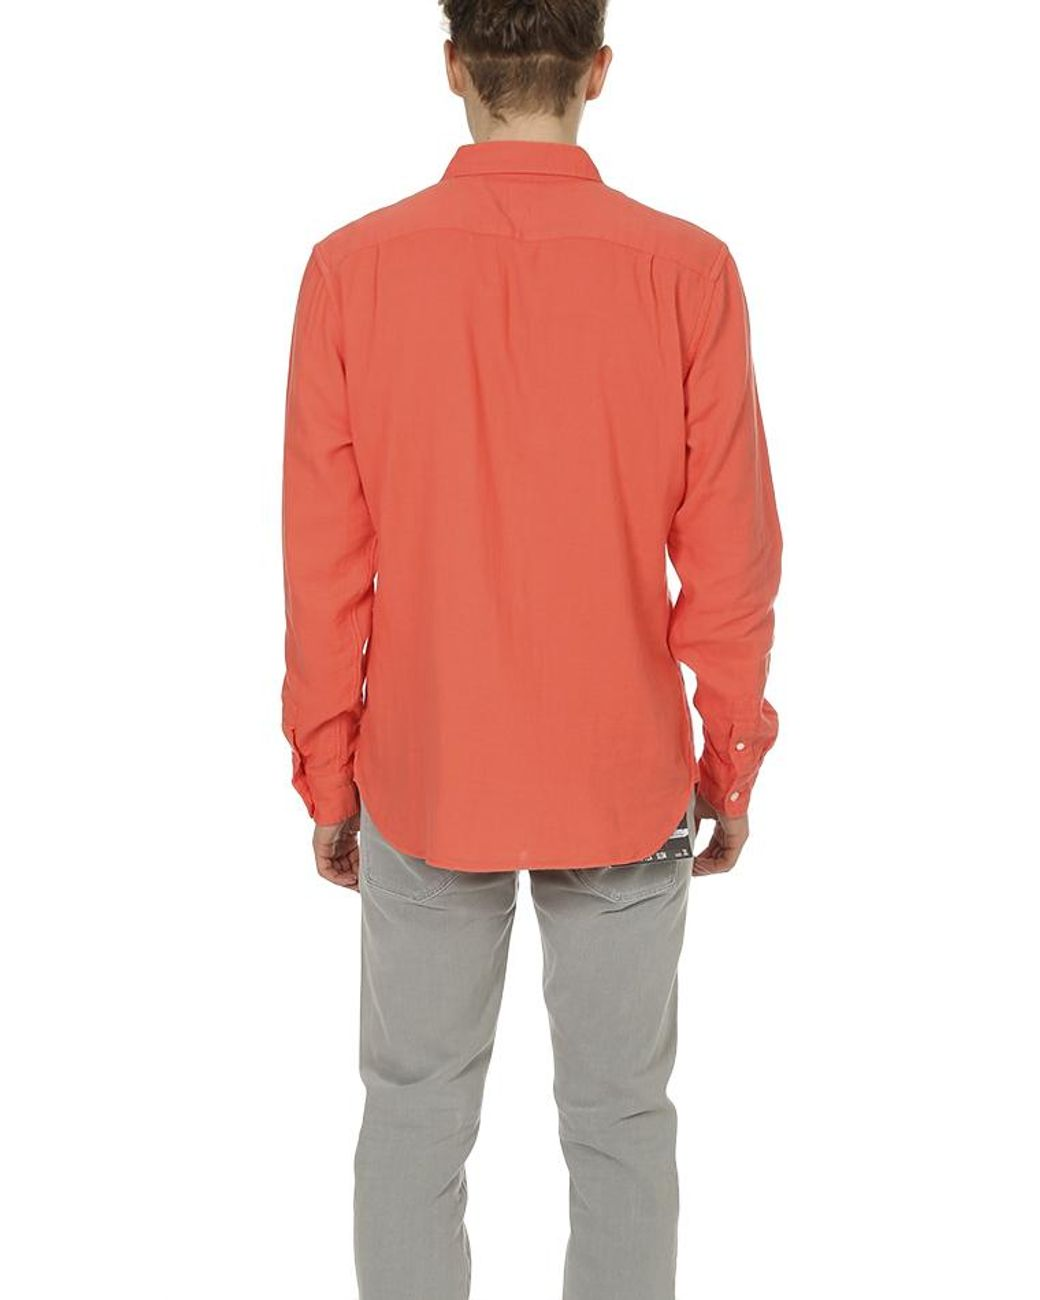 NWT HUGO BOSS C-MENZO US RED LABEL DRESS SHIRT REGULAR FIT NAVY PLAID CHECKED